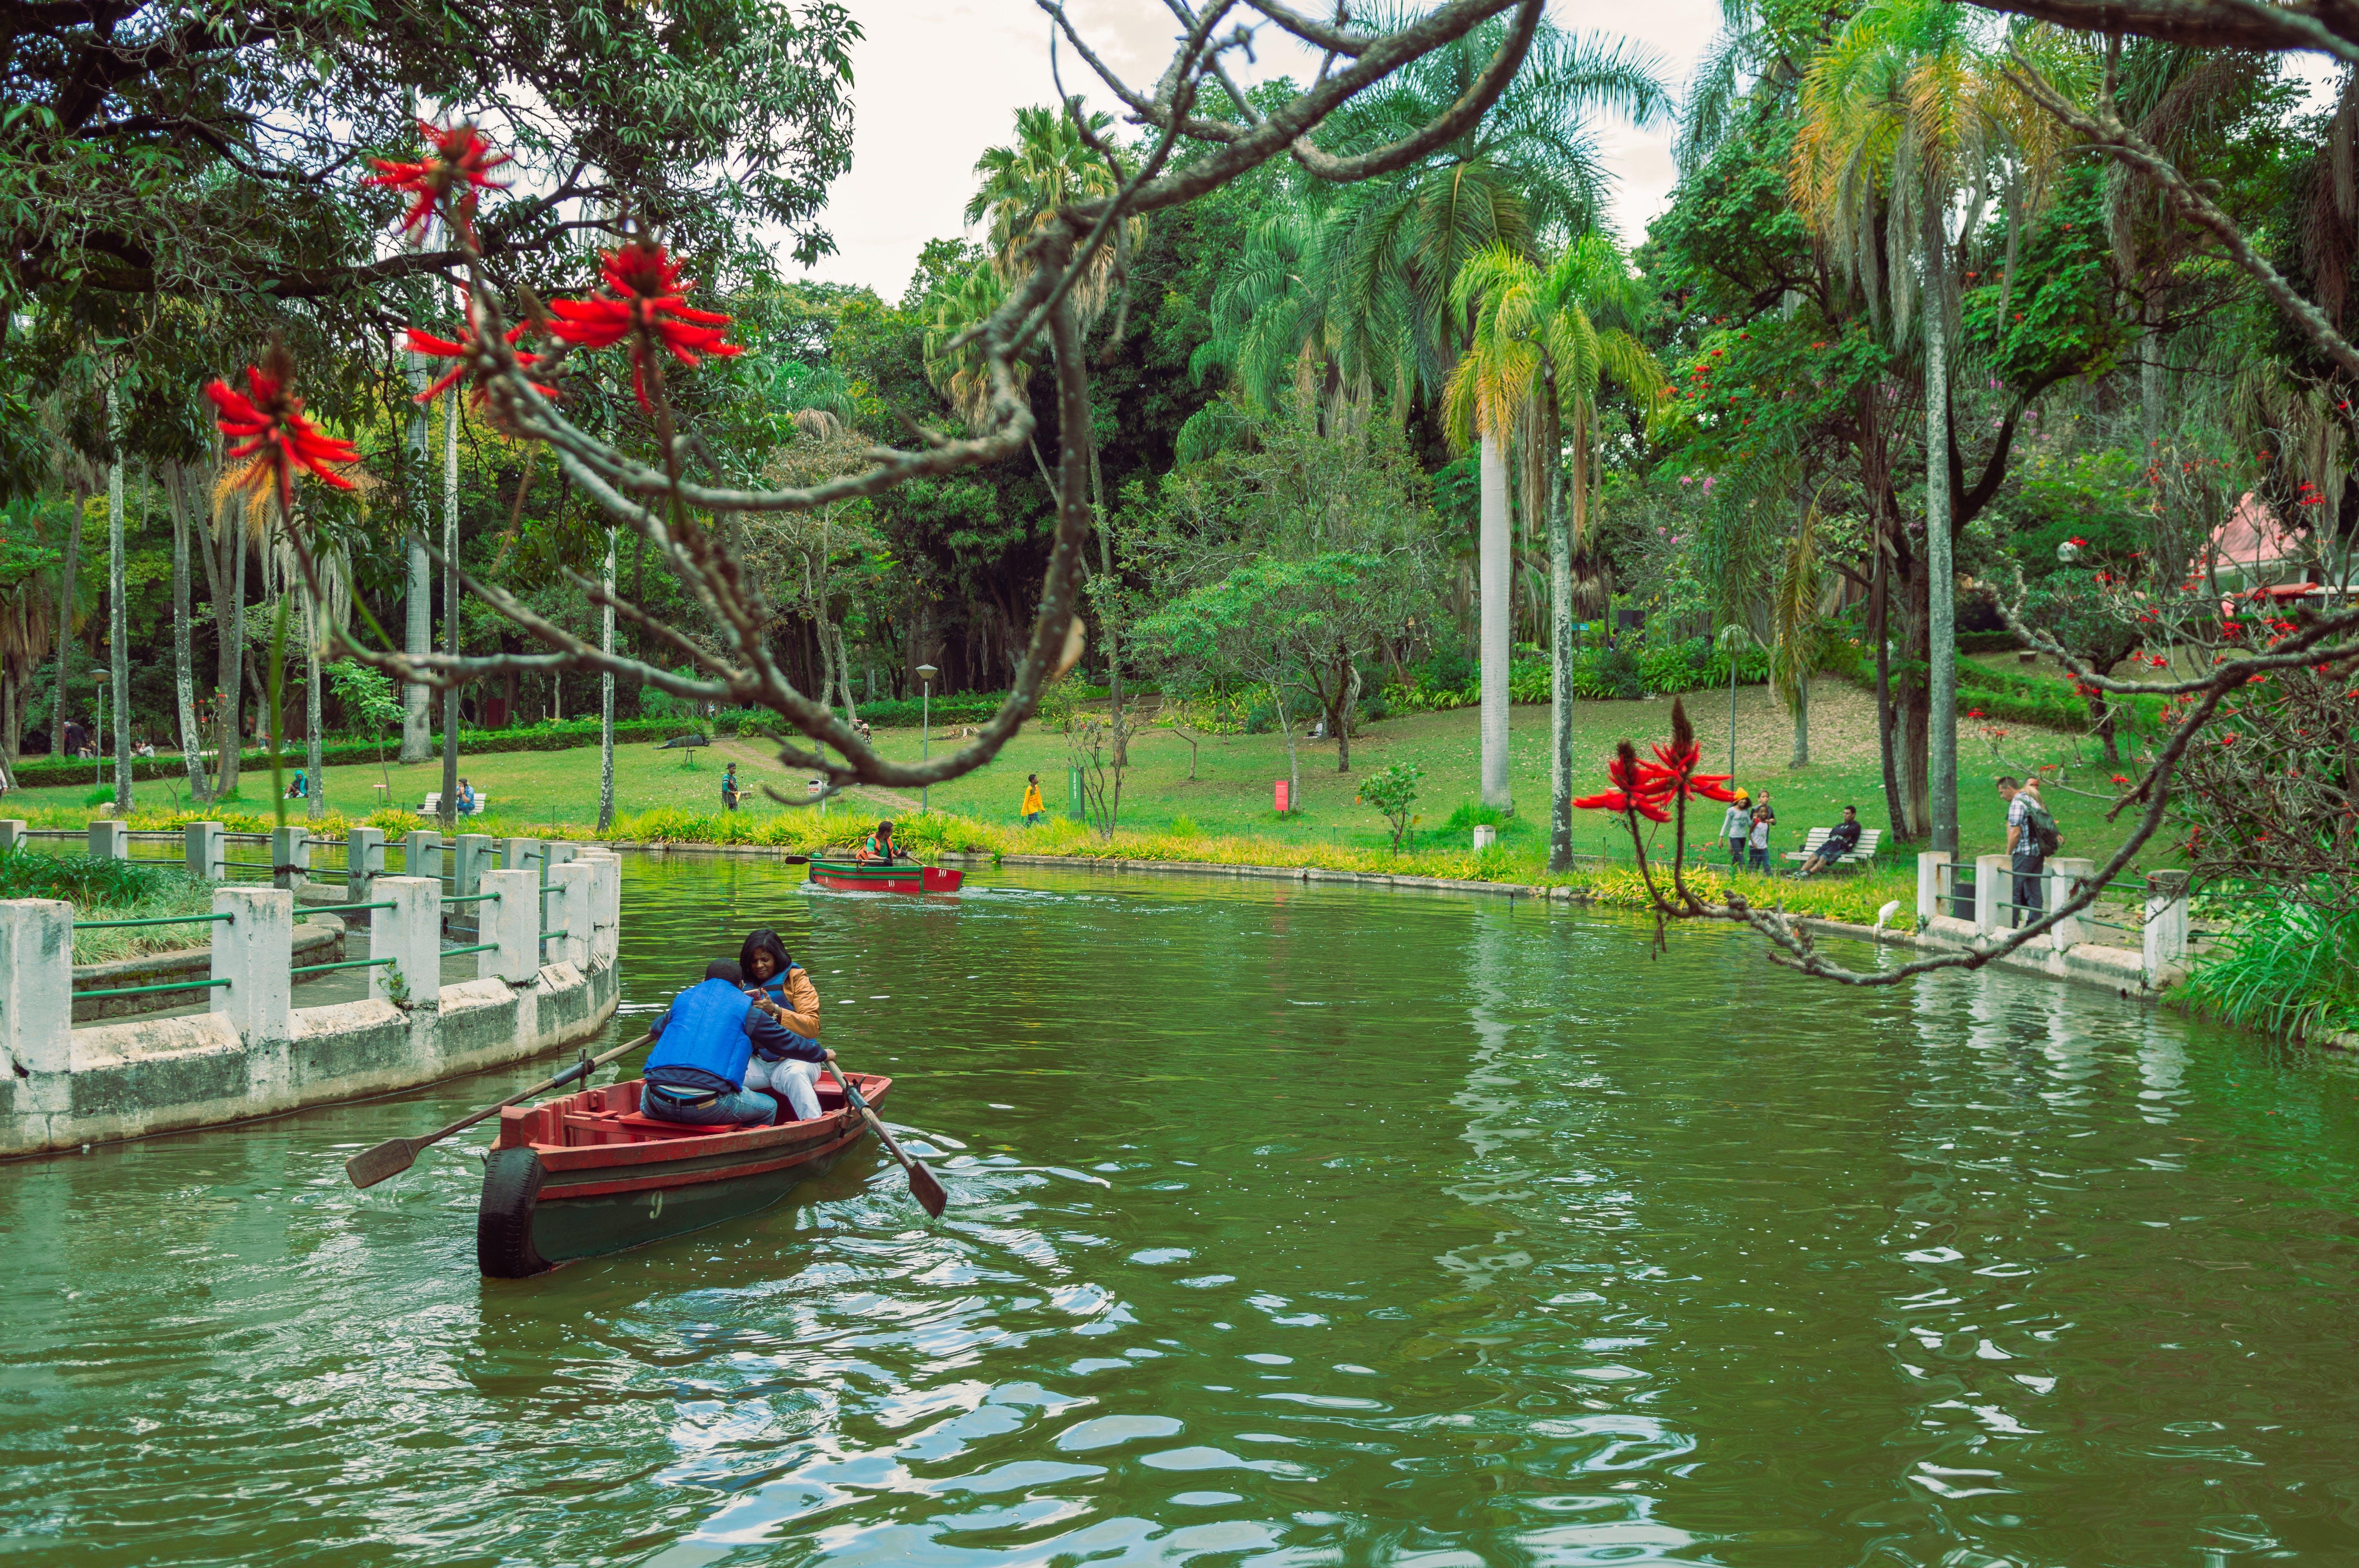 Photos gratuites de arbre vert, arbres, bateau, canoë